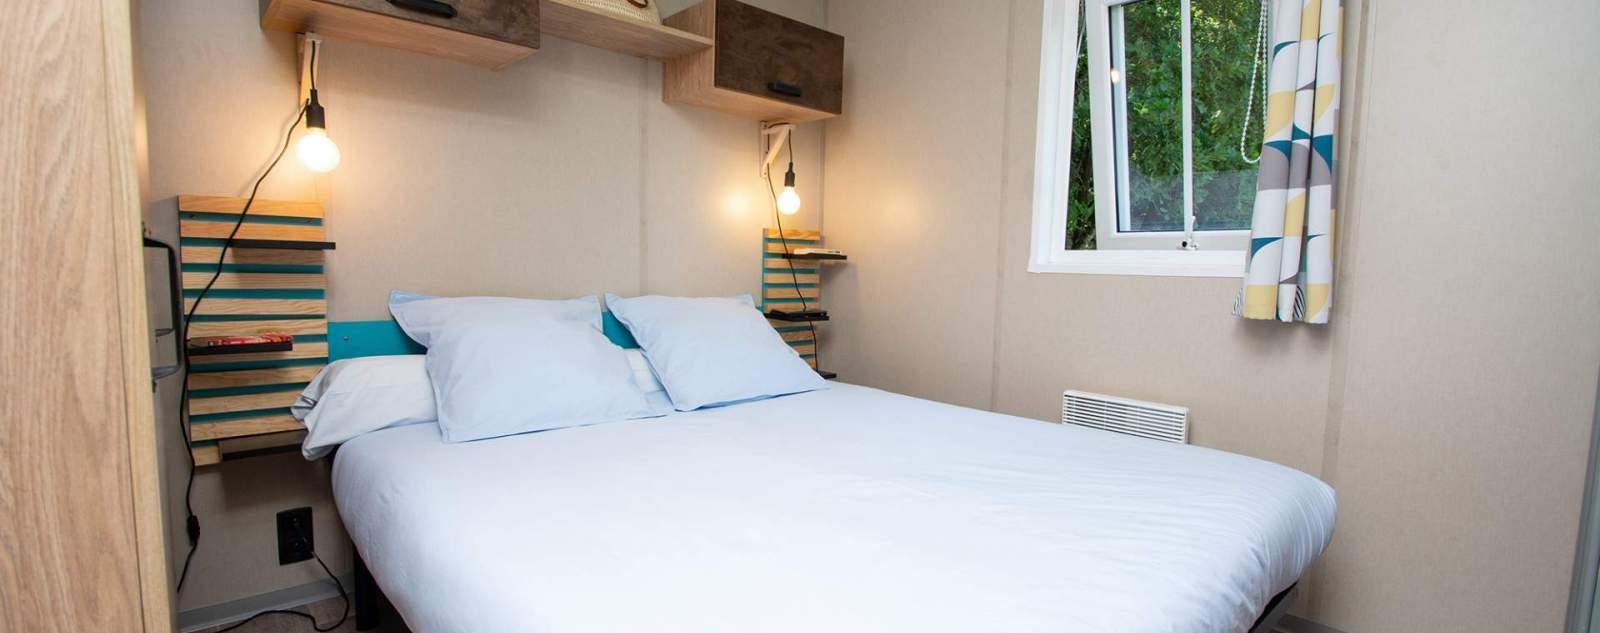 186 hebergement chambre cottage premium 1600x633